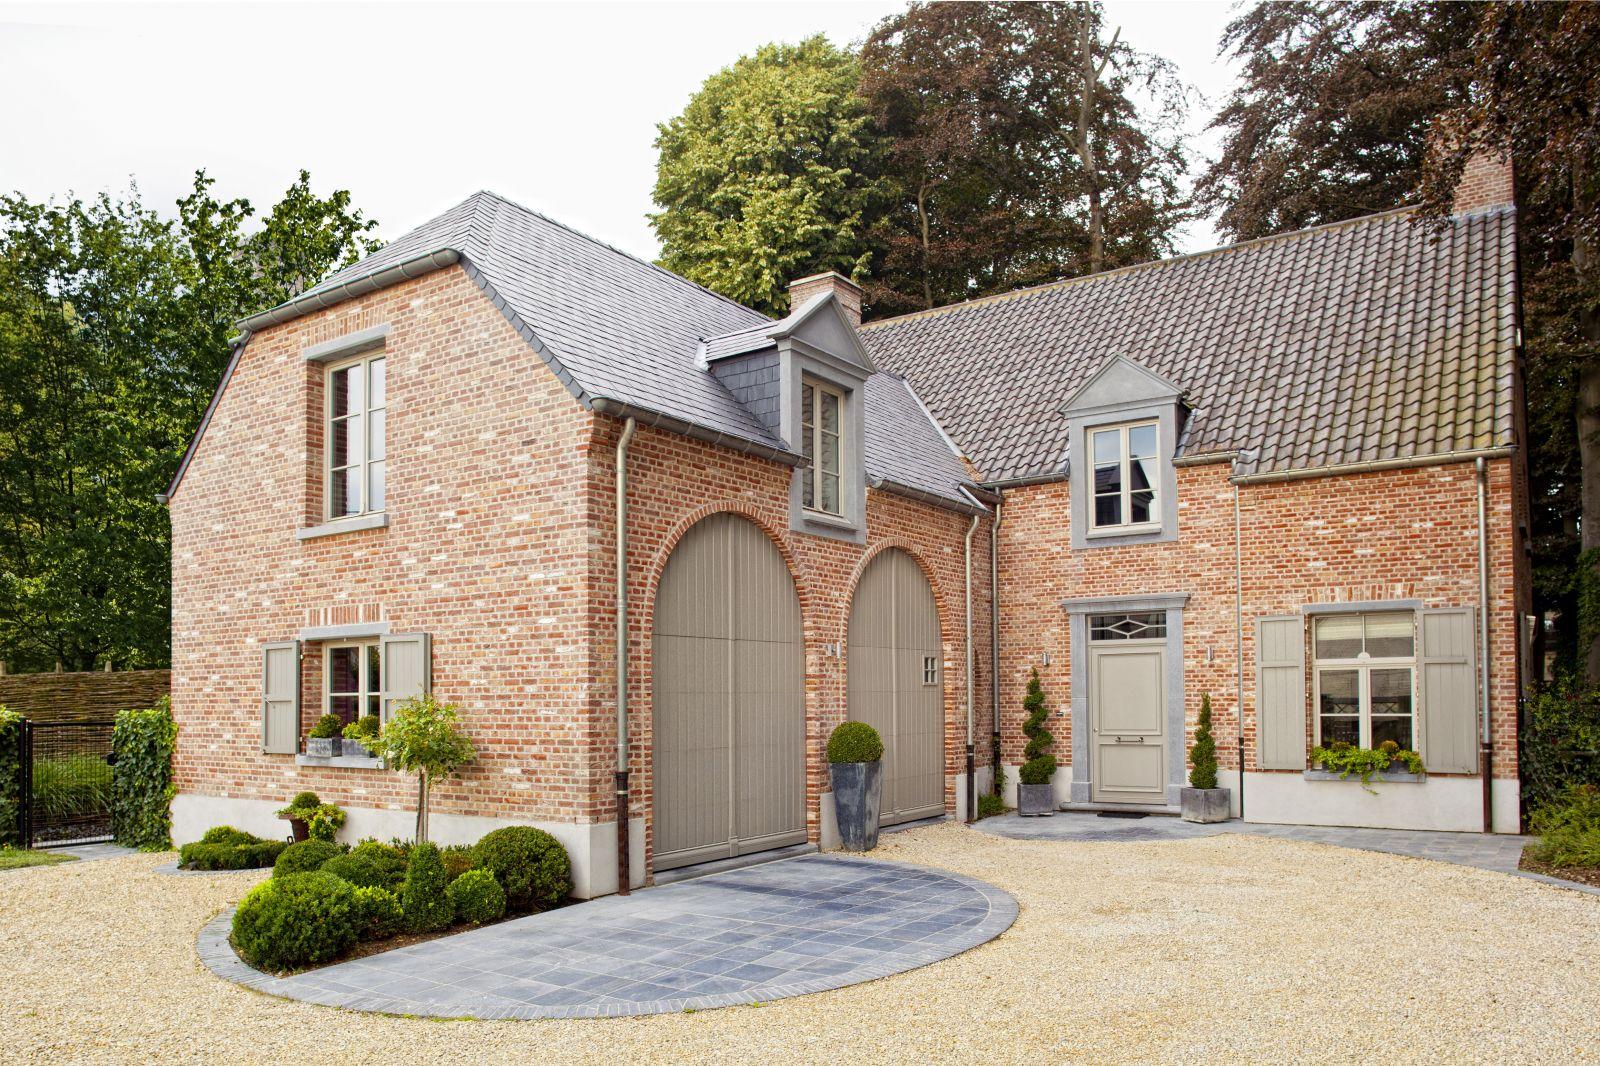 Woning bouwen architect luxe woningen architectenbureau gruwez oudenaarde gent woning bouwen - Hoe een overdekt terras te bouwen ...